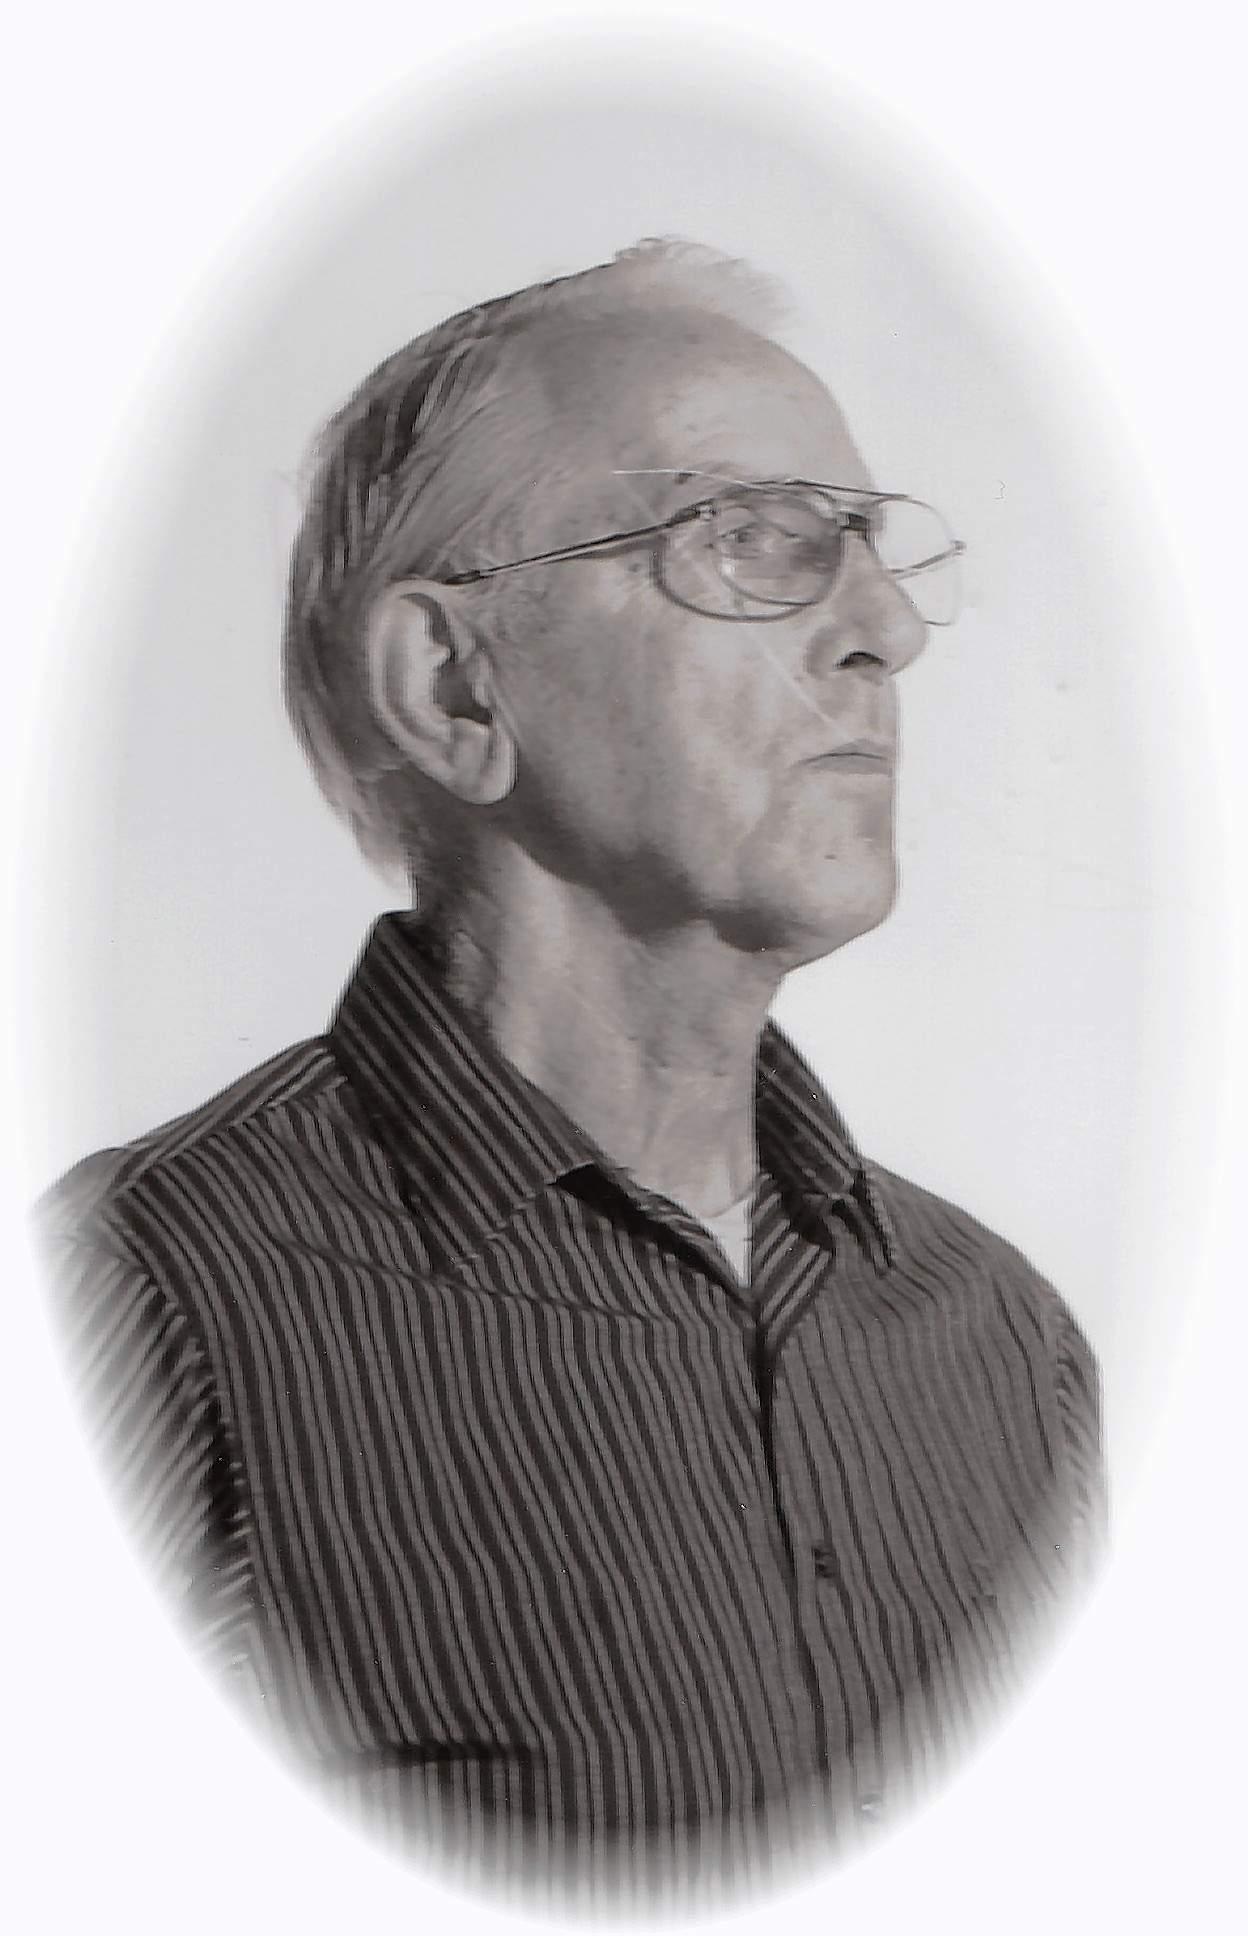 Donald Kuhnert